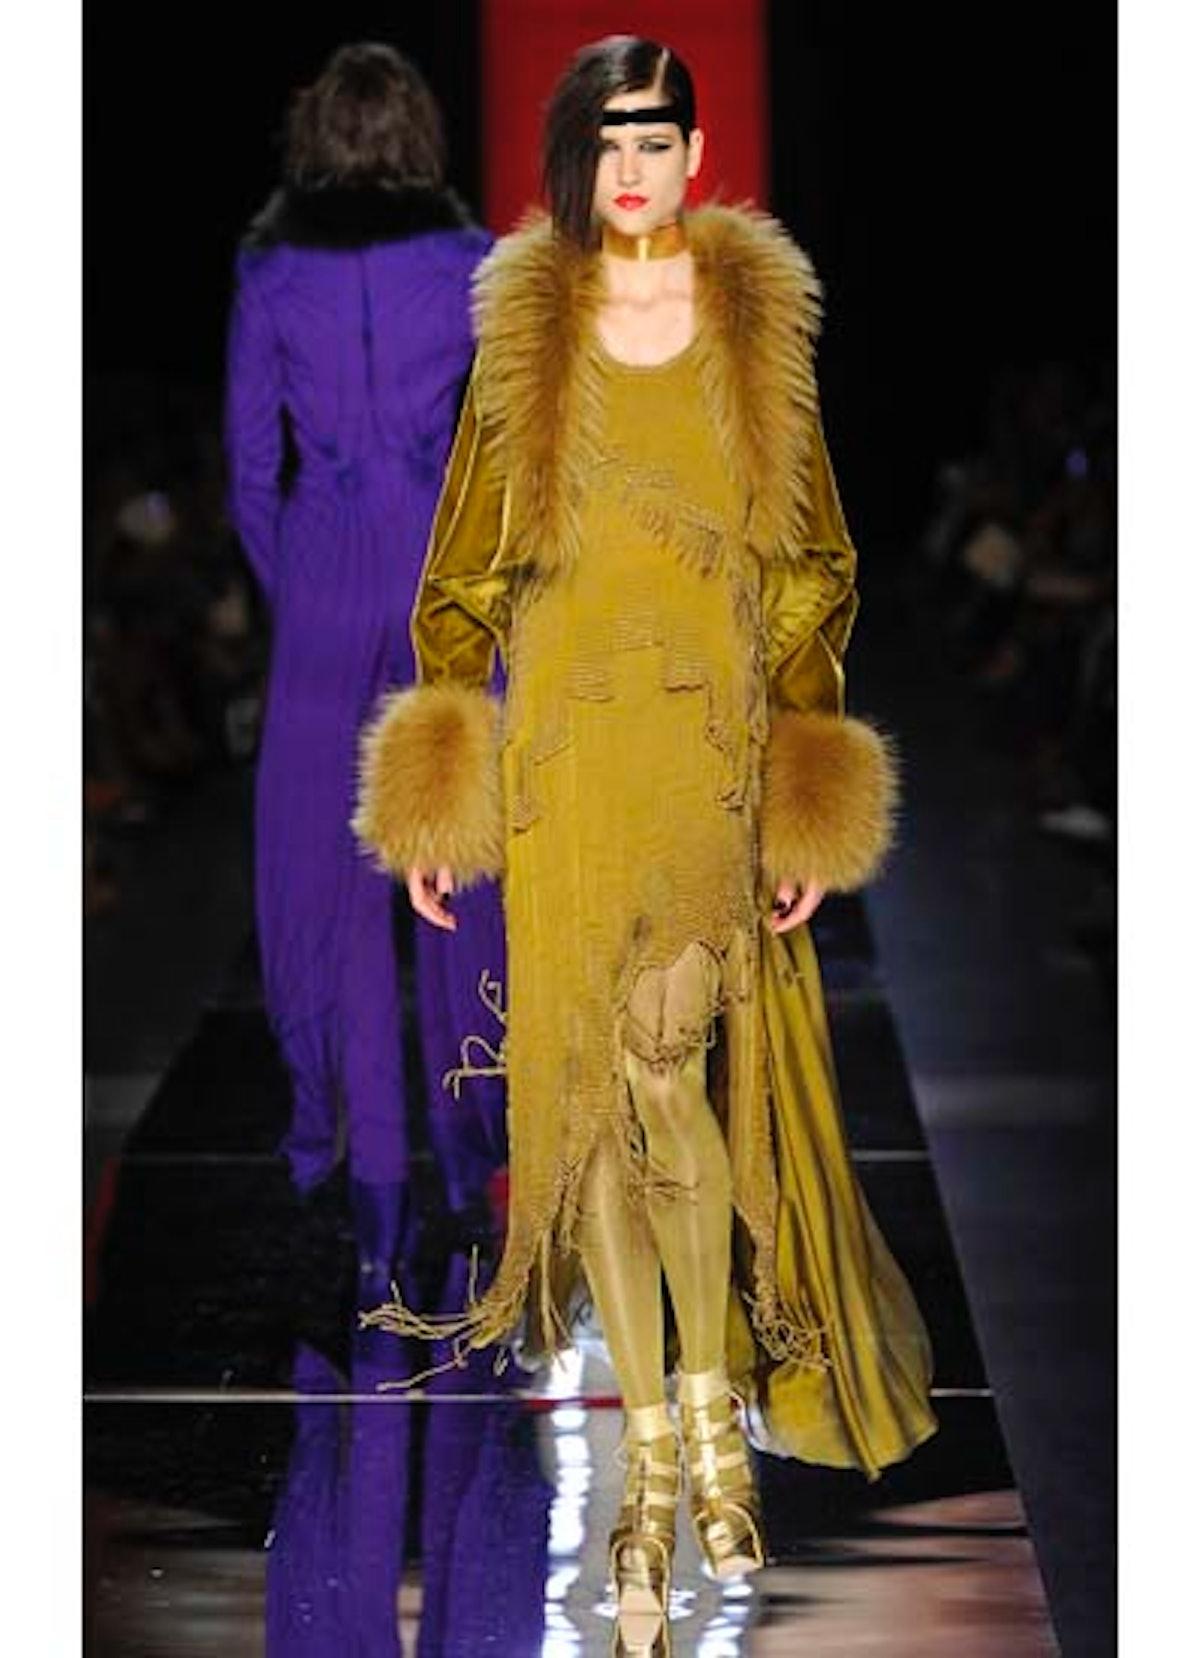 fass-jean-paul-gaultier-couture-2012-runway-28-v.jpg